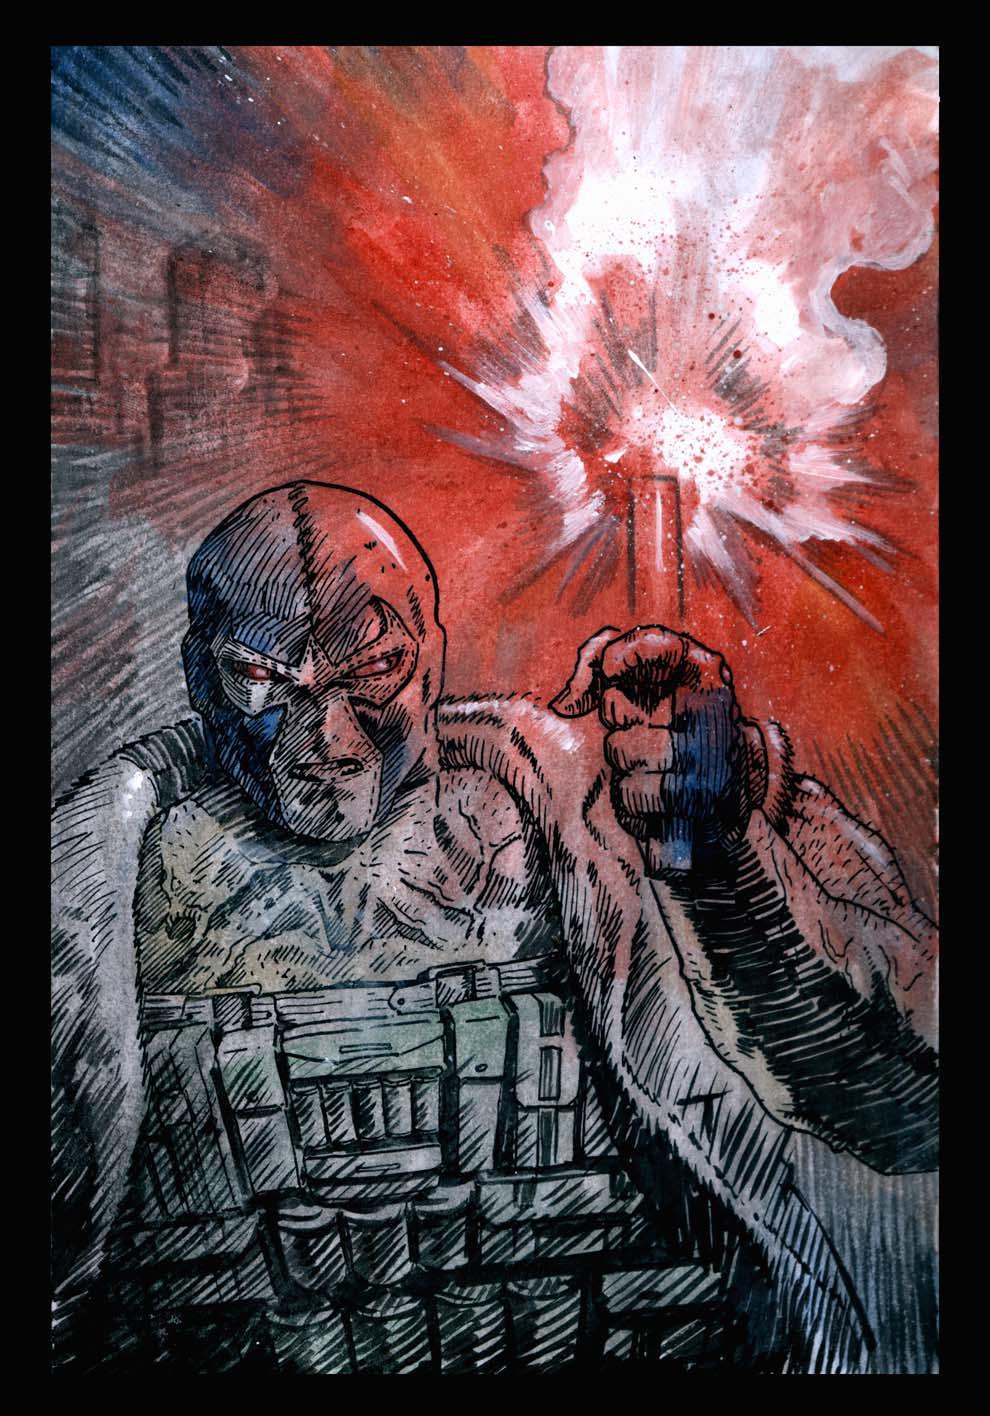 Bane by santiagocomics